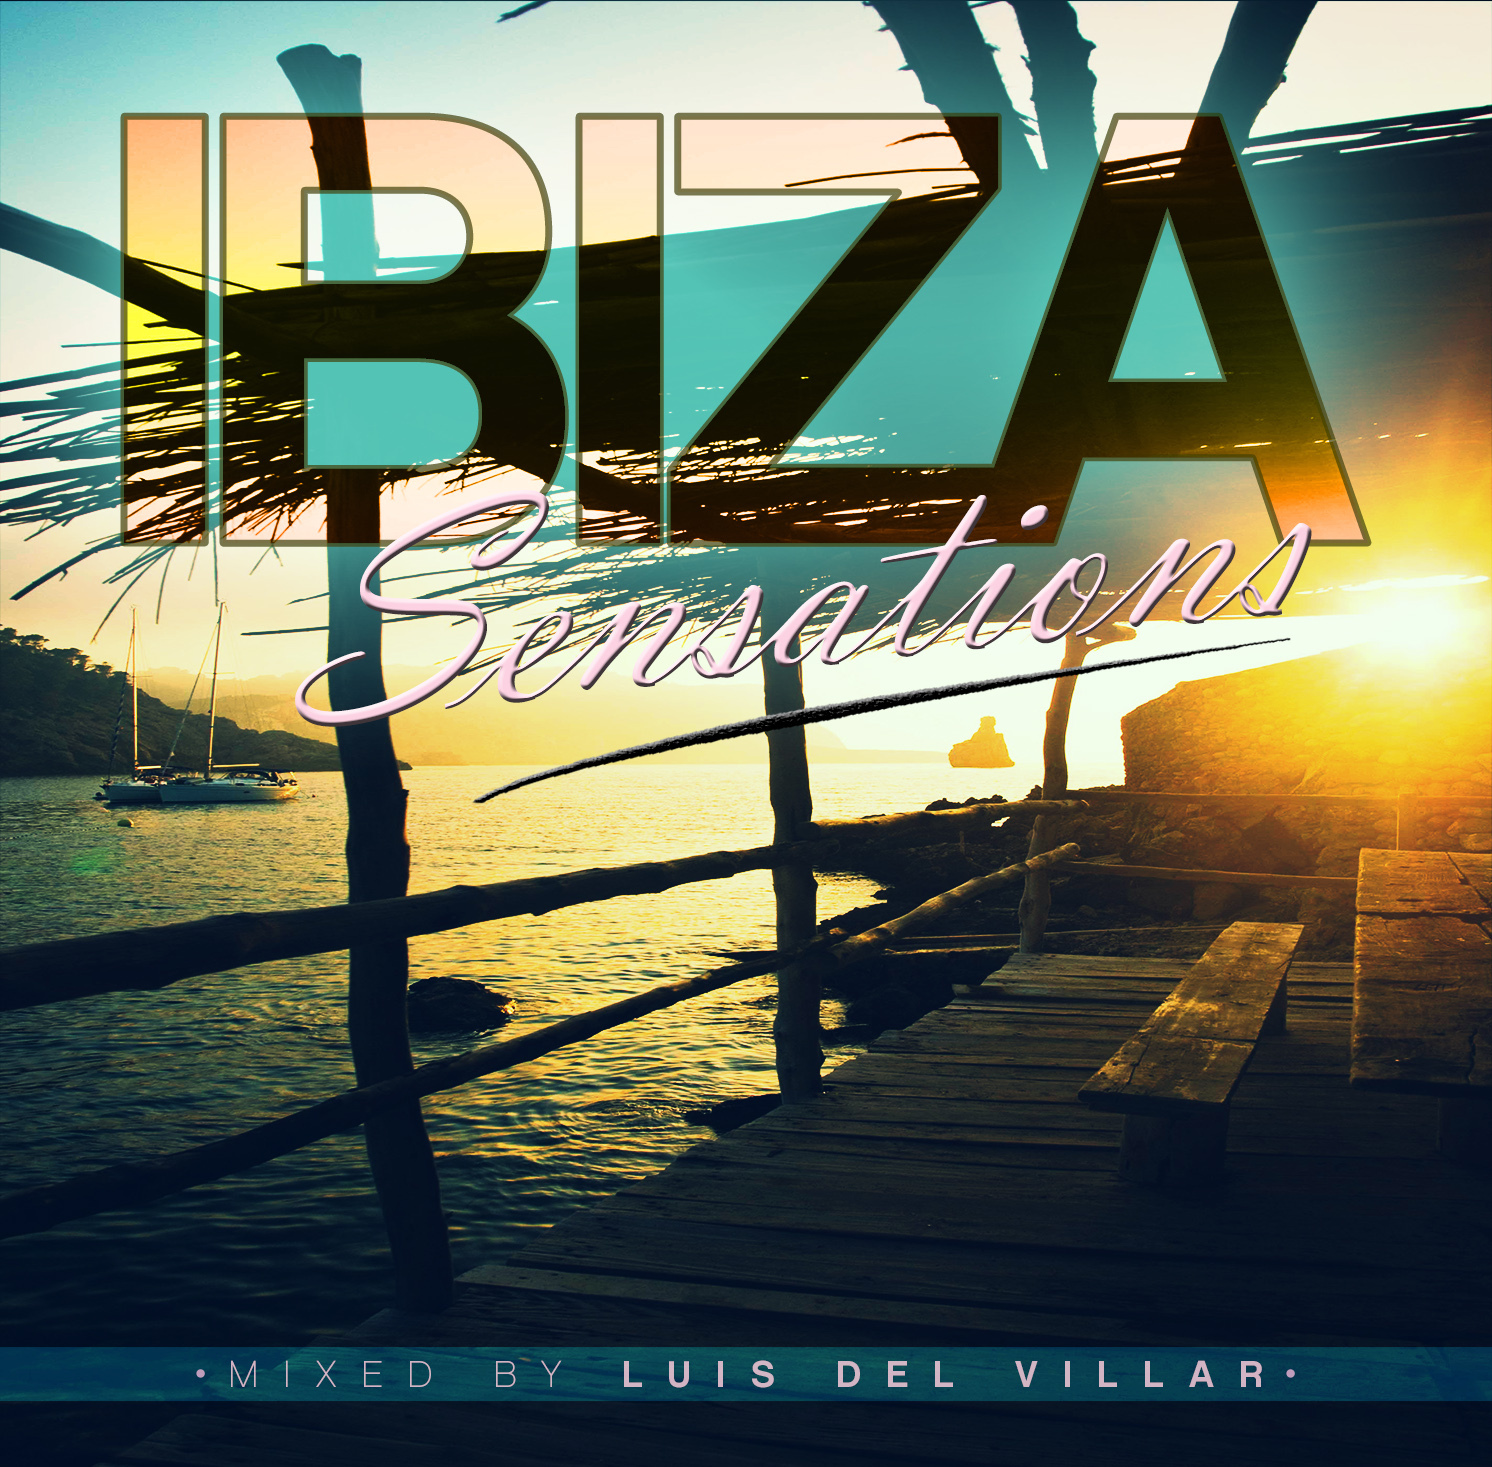 Ibiza Sensations 66 MP3